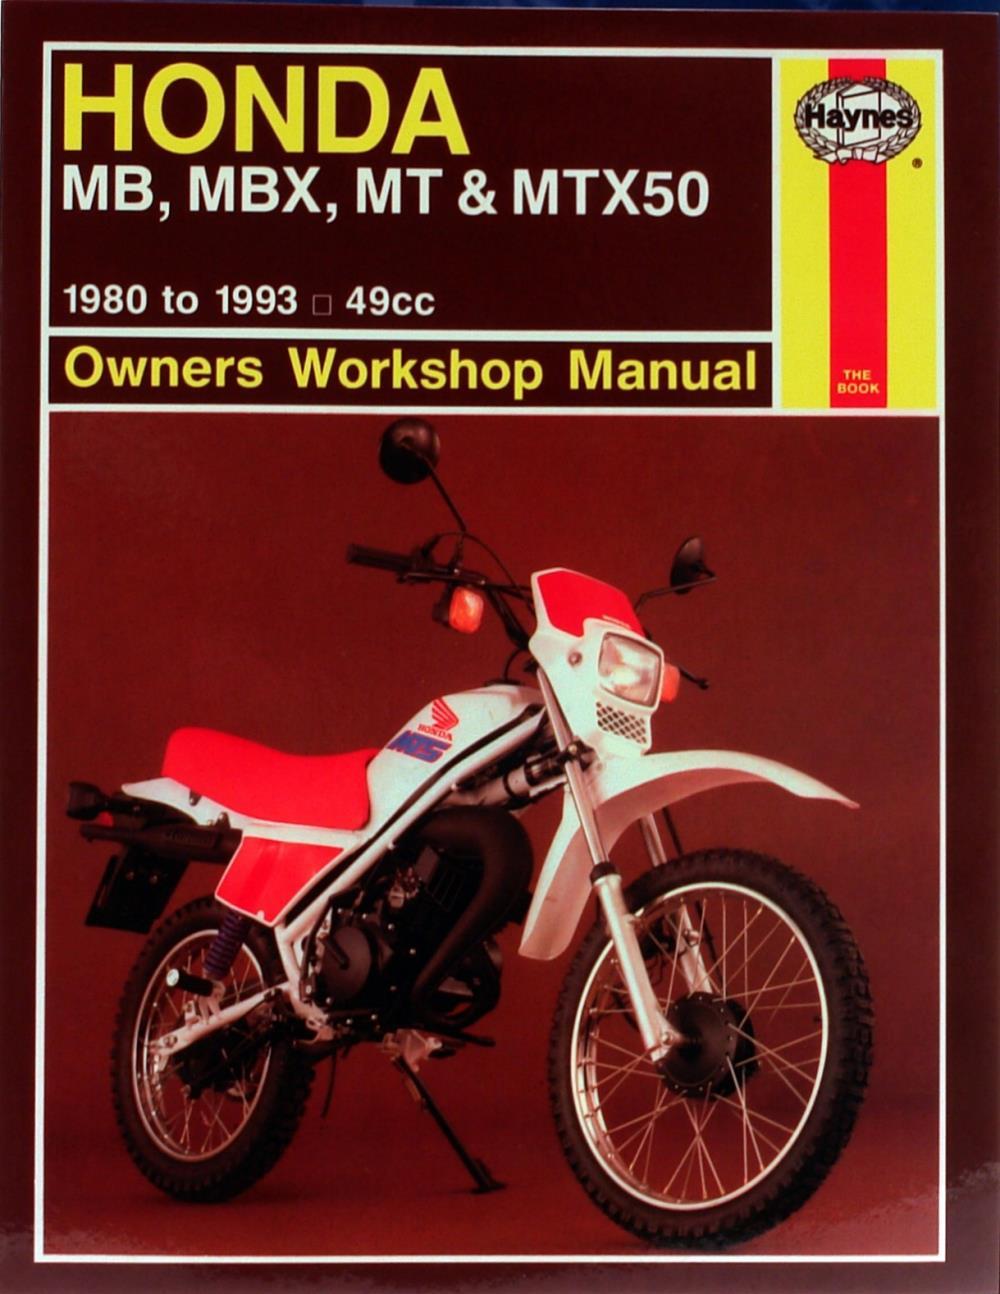 manual haynes for 1980 honda mt 50 sa ebay rh ebay co uk Airb Ladfe Honda Motorcycle Manuals Honda Shadow Motorcycle